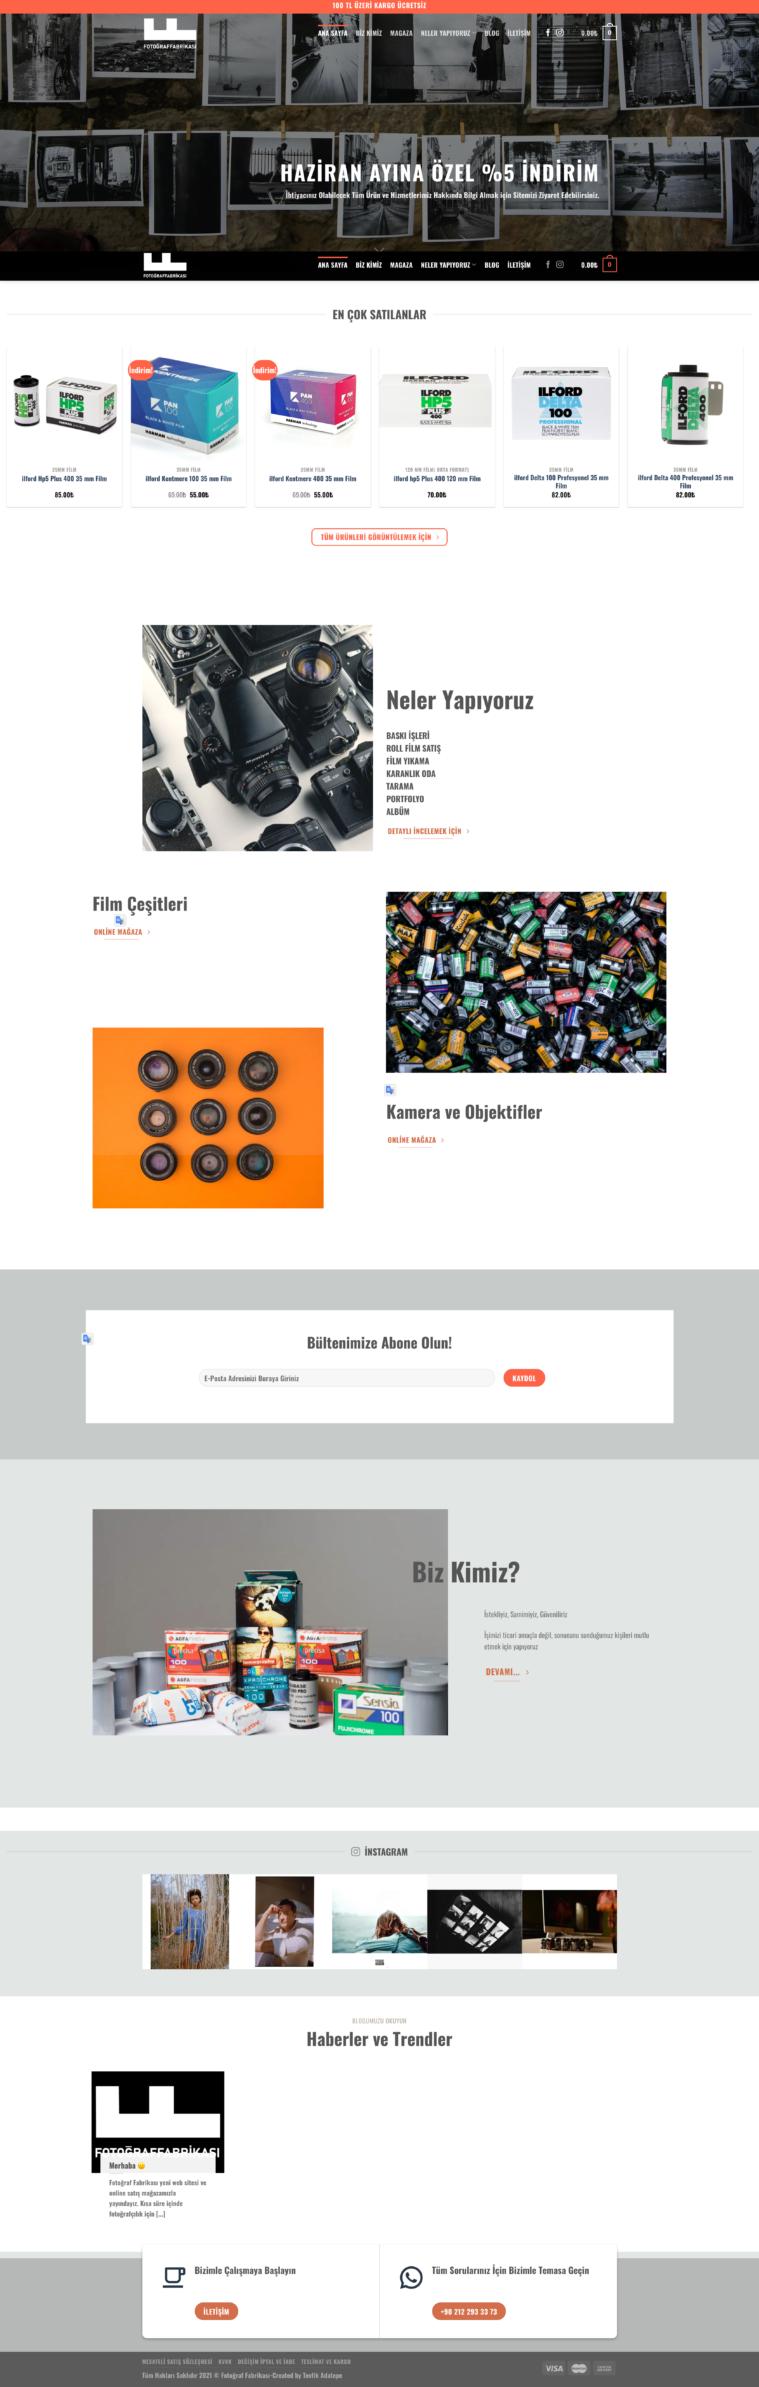 fotoğraf fabrikası, web design, web tasarım, e-ticaret